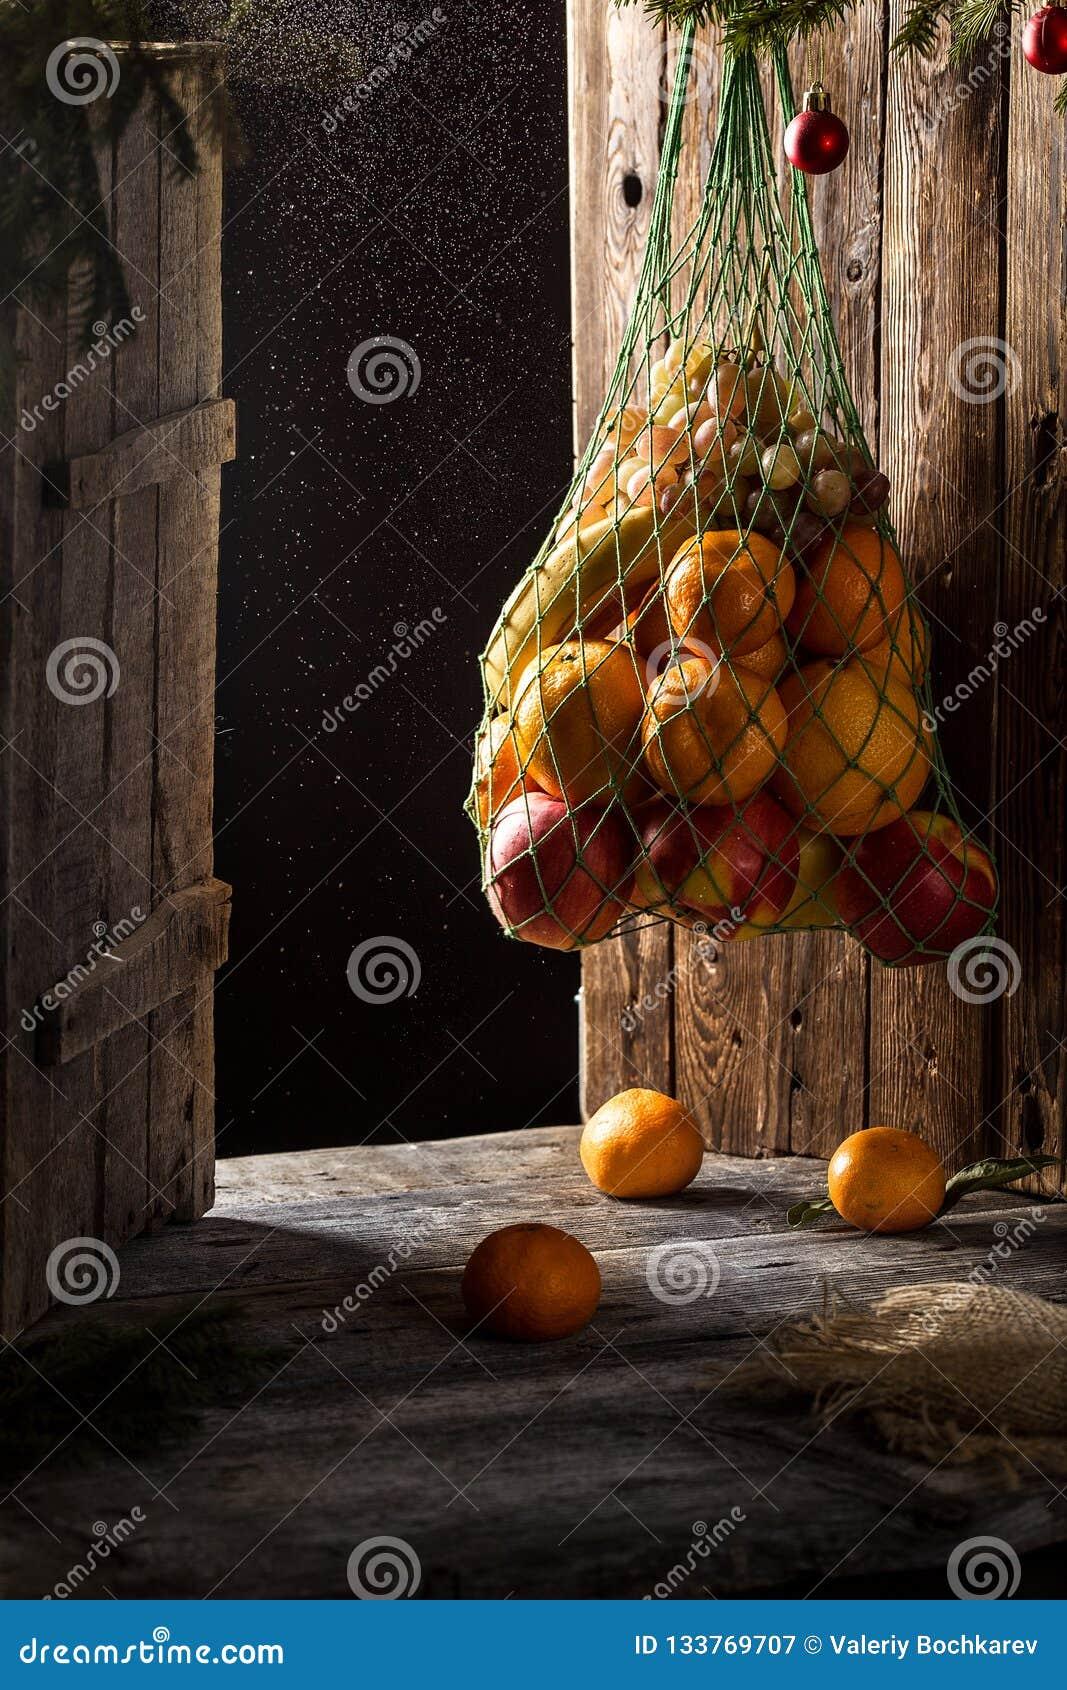 Cartolina di Natale con frutta mele, arance, mandarini, banane